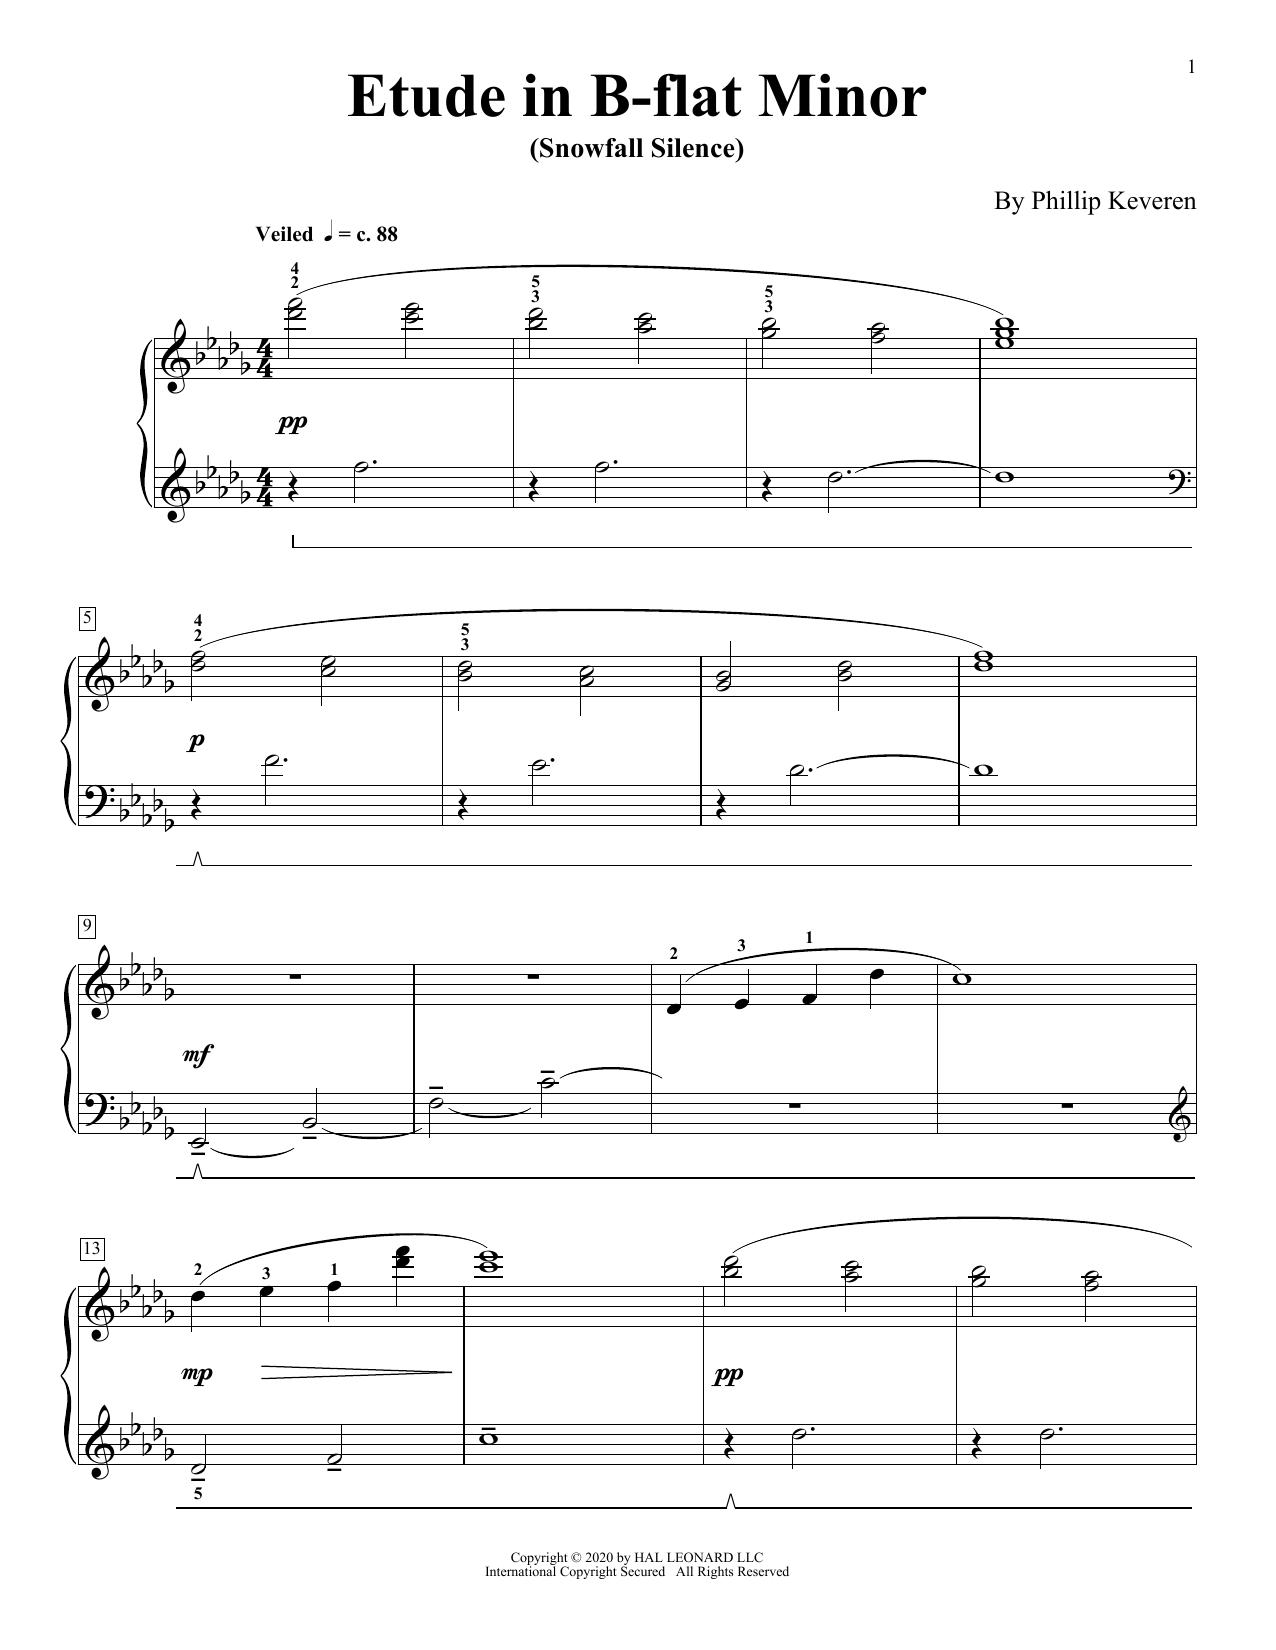 Etude In B-Flat Minor (Snowfall Silence) (Piano Solo)